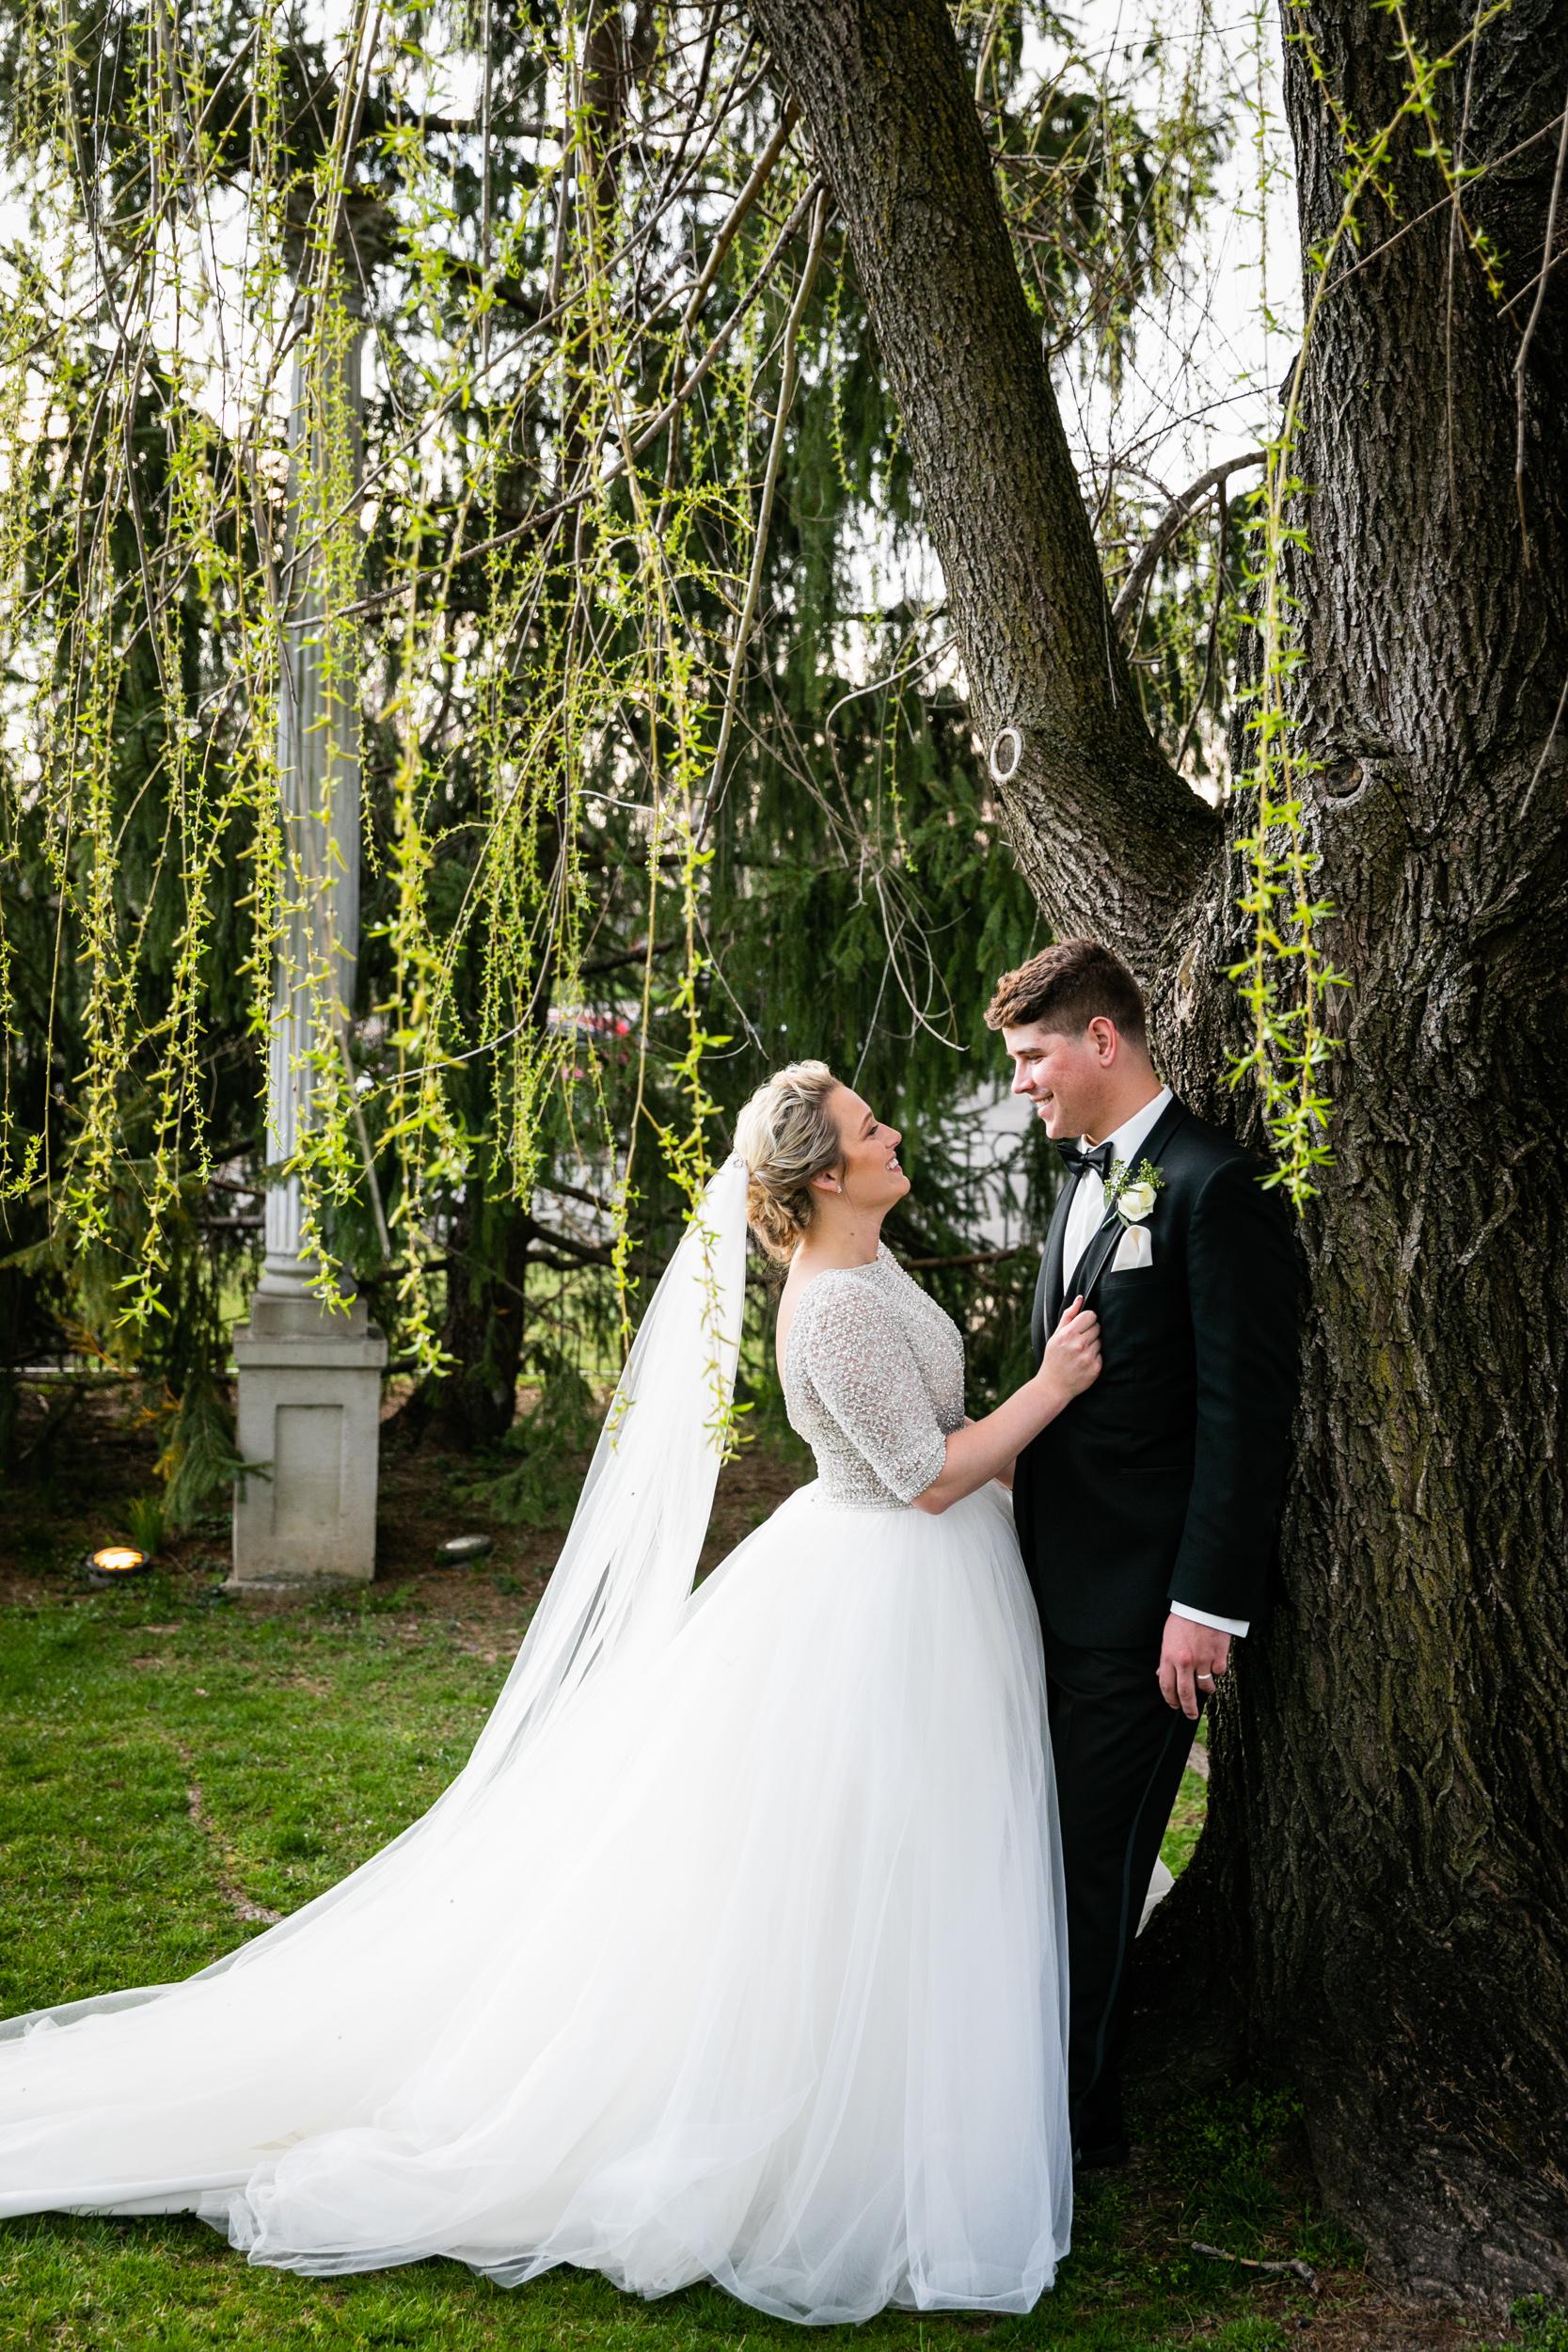 CELEBRATIONS BENSALEM WEDDING PHOTOGRAPHY-70.jpg